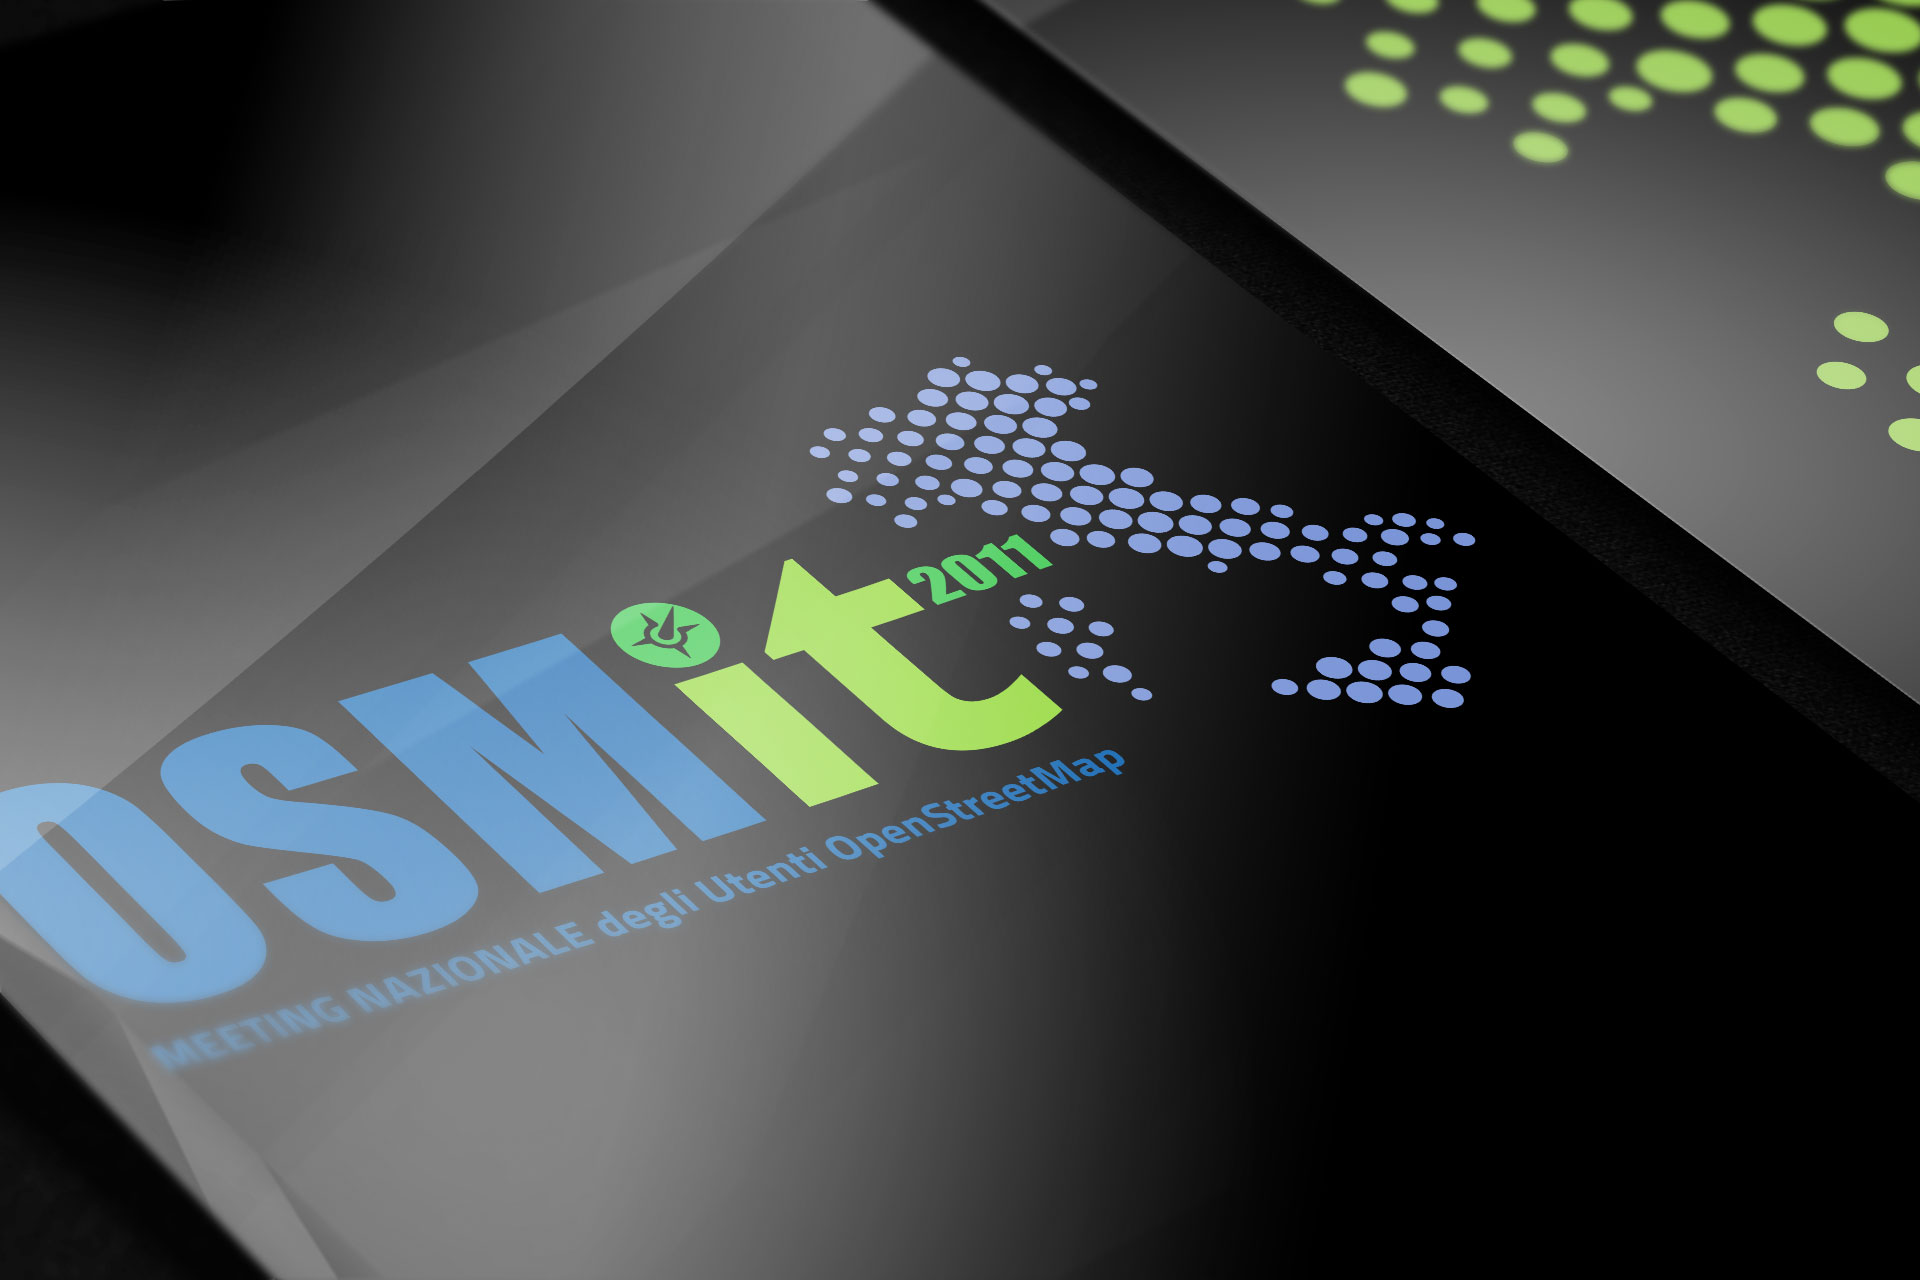 OSMit 2011 / Il marchio